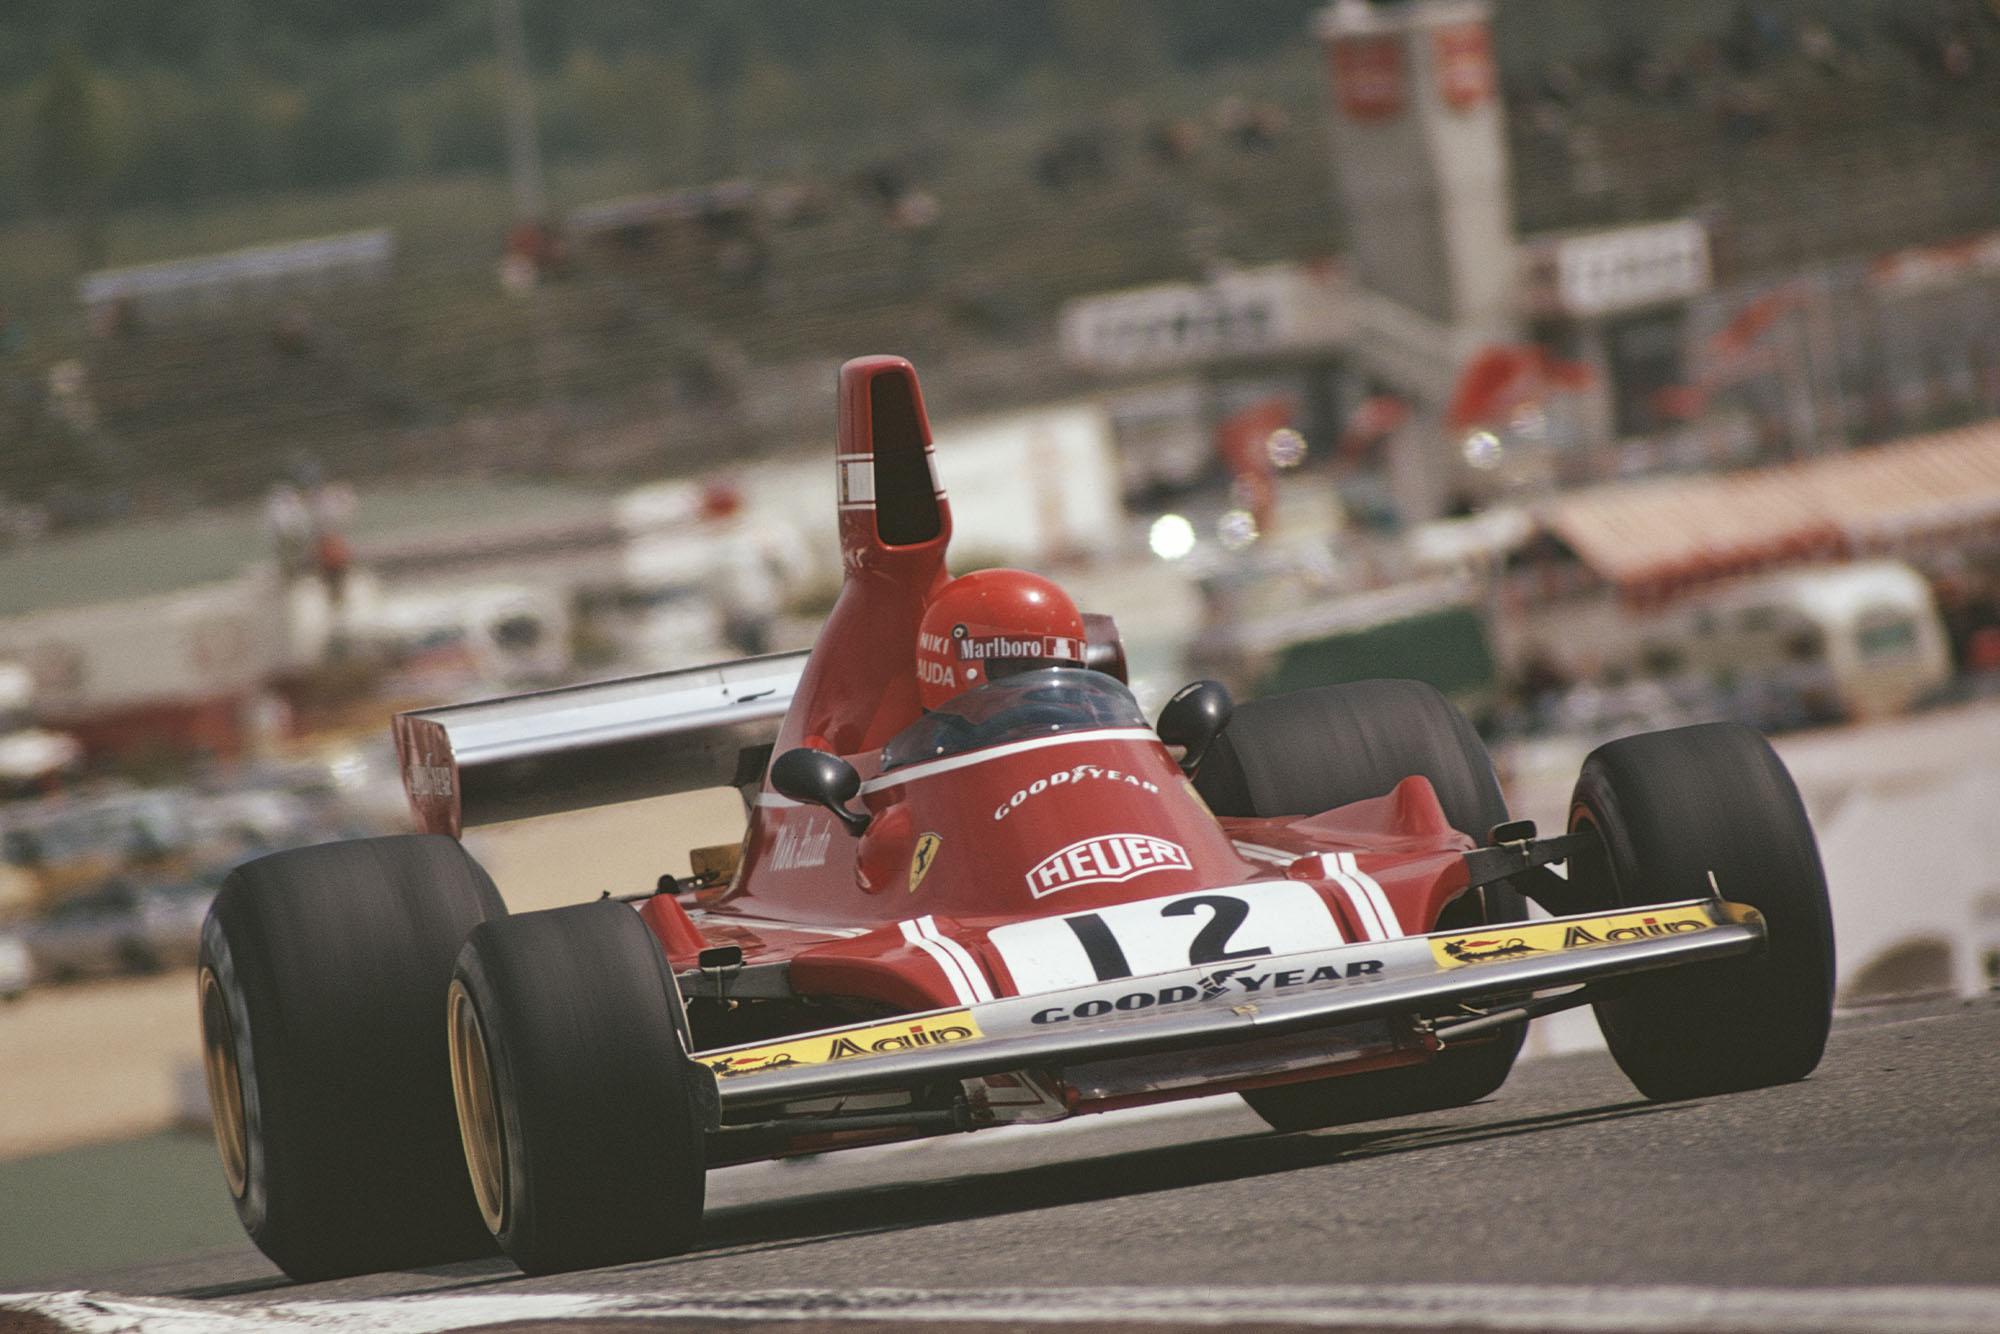 Niki Lauda (Ferrari) at the 1974 Spanish Grand Prix, Jarama.